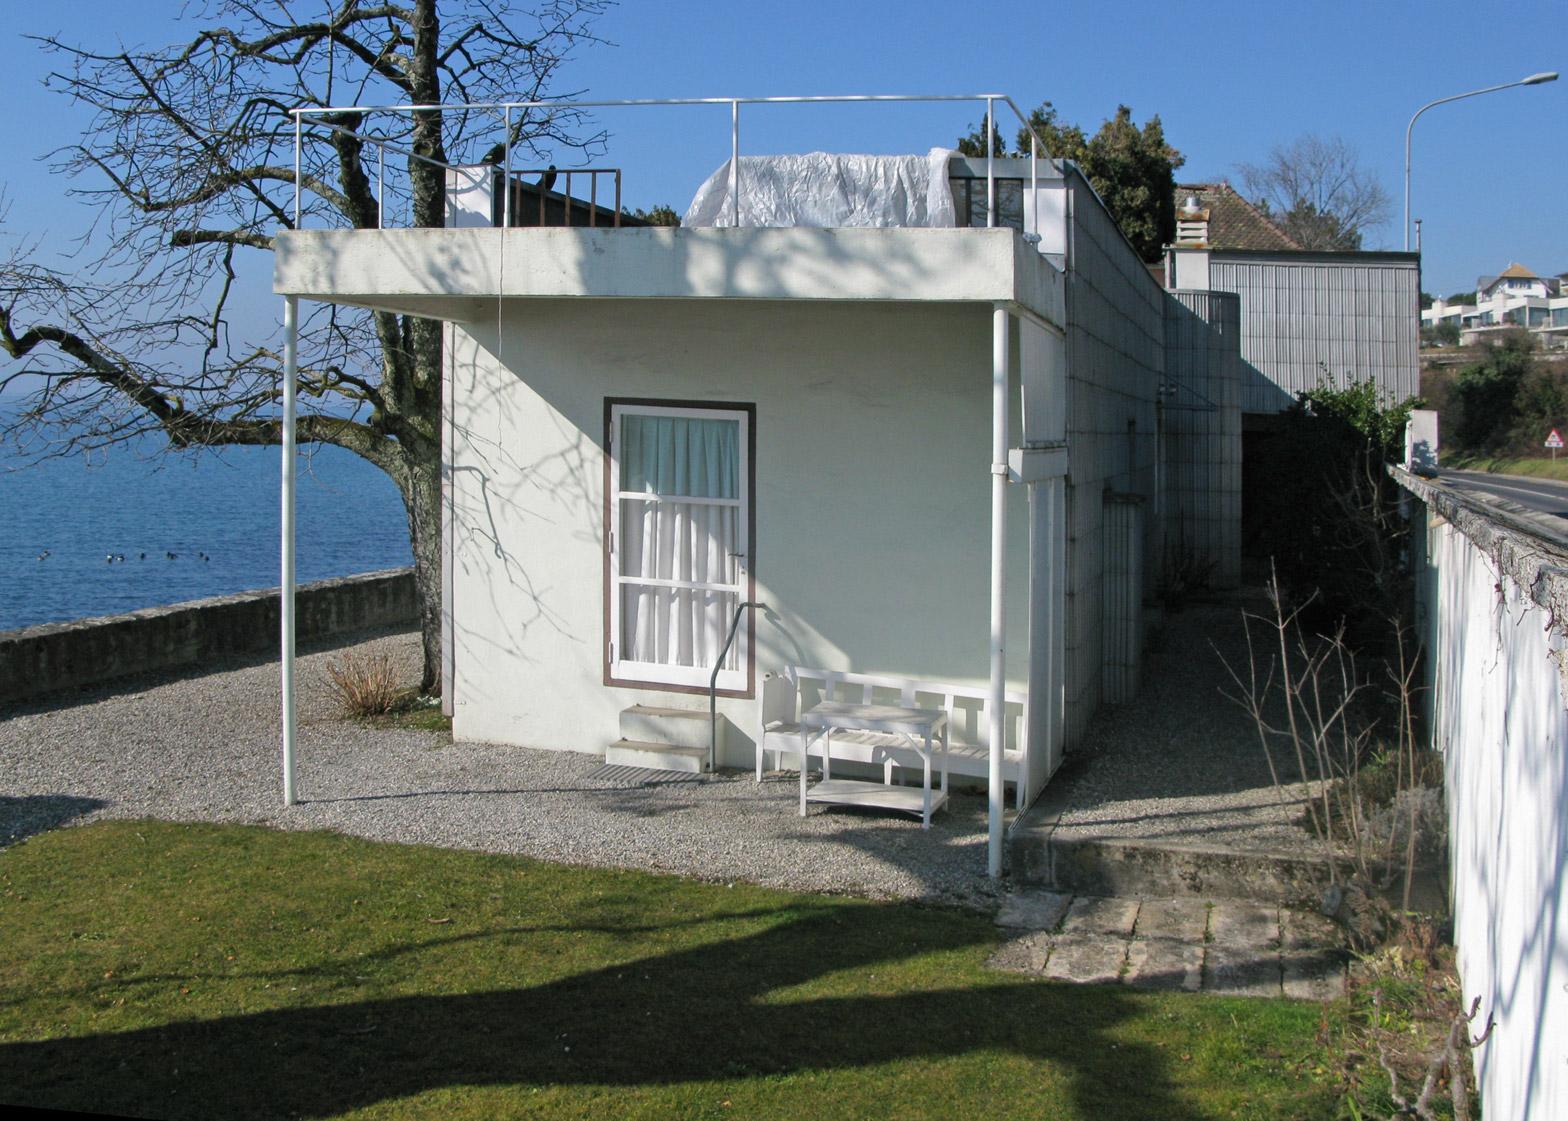 Le Corbusier's Villa Le Lac by Villa Le in Corseaux, Switzerland